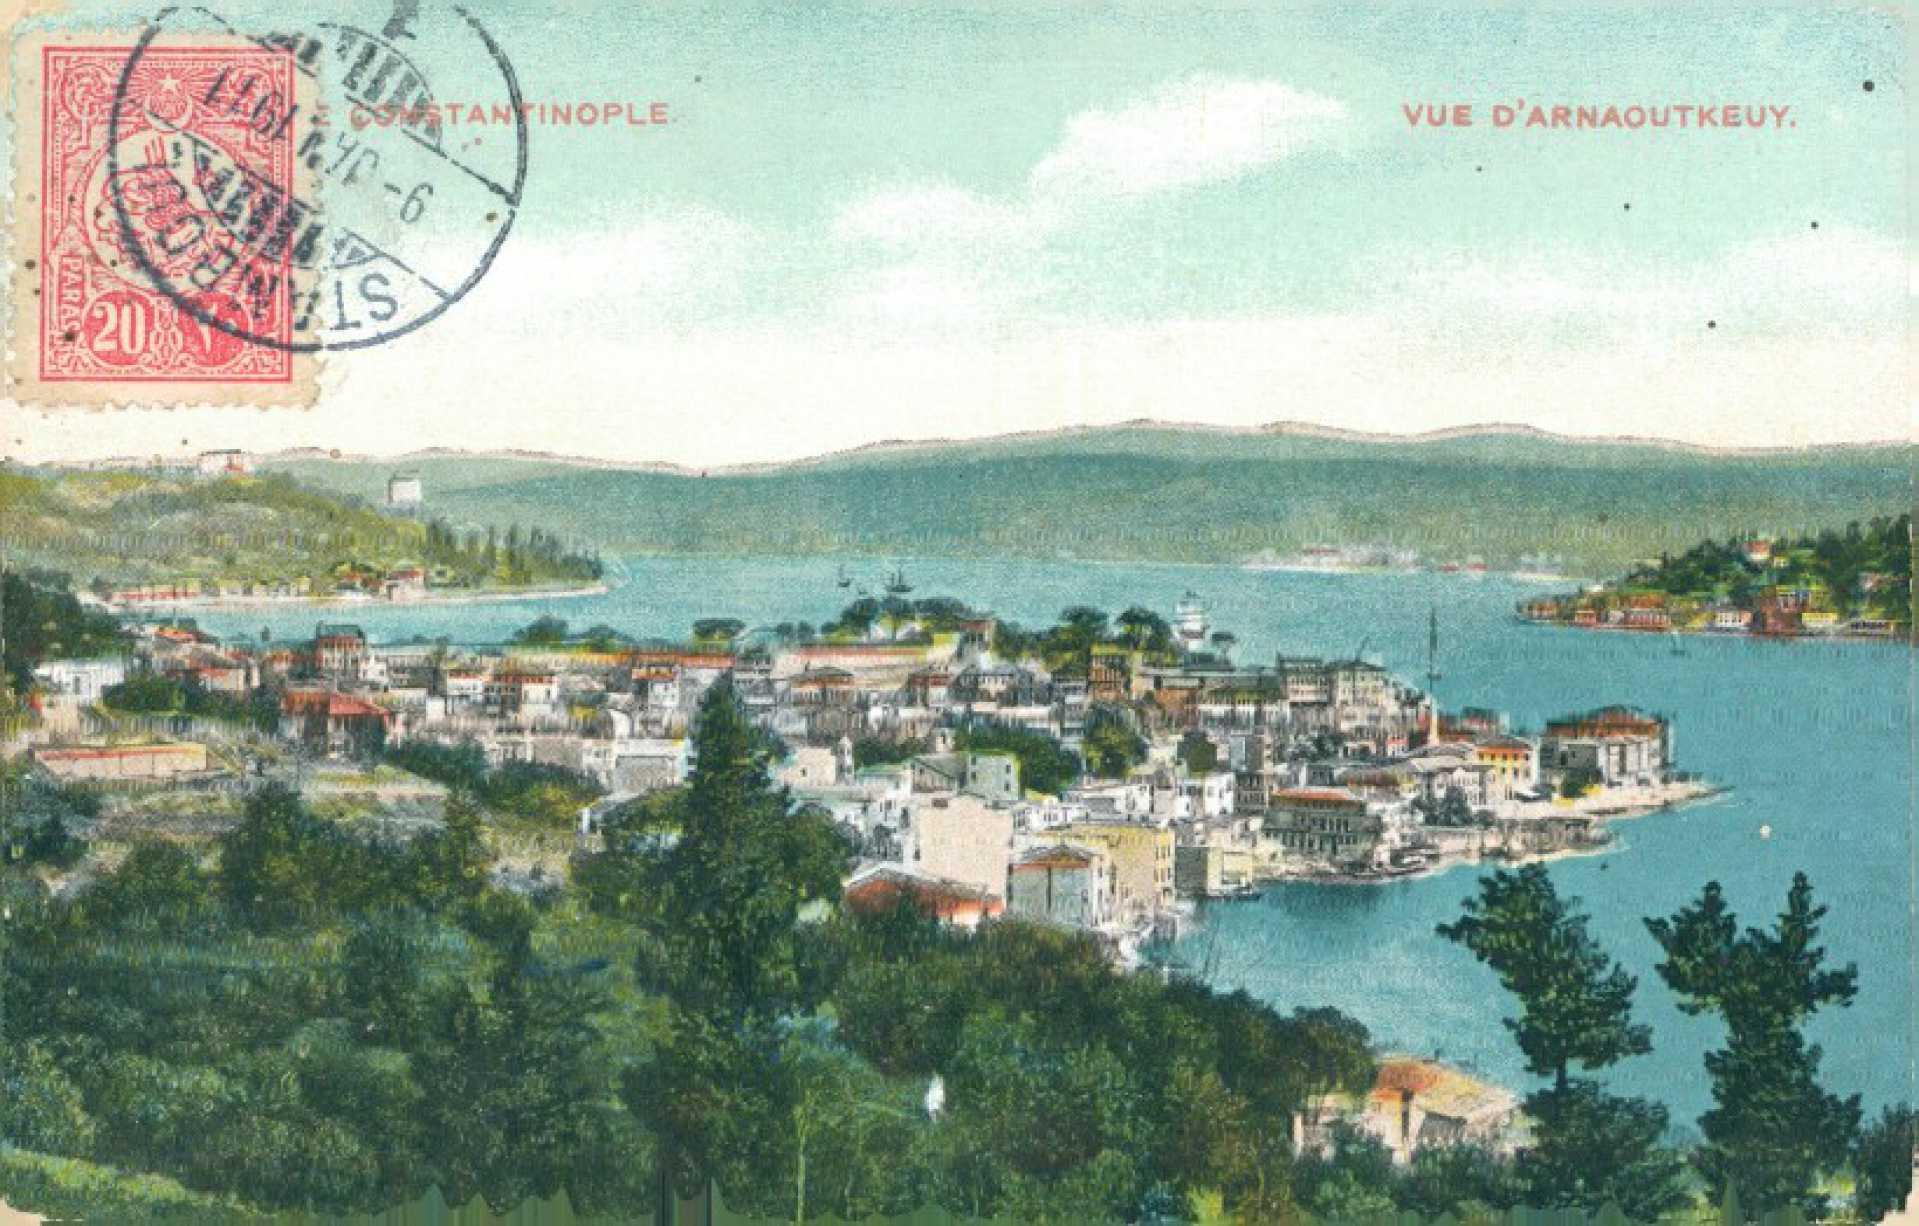 Constantinople. Vue d'Arnaoutkeuy